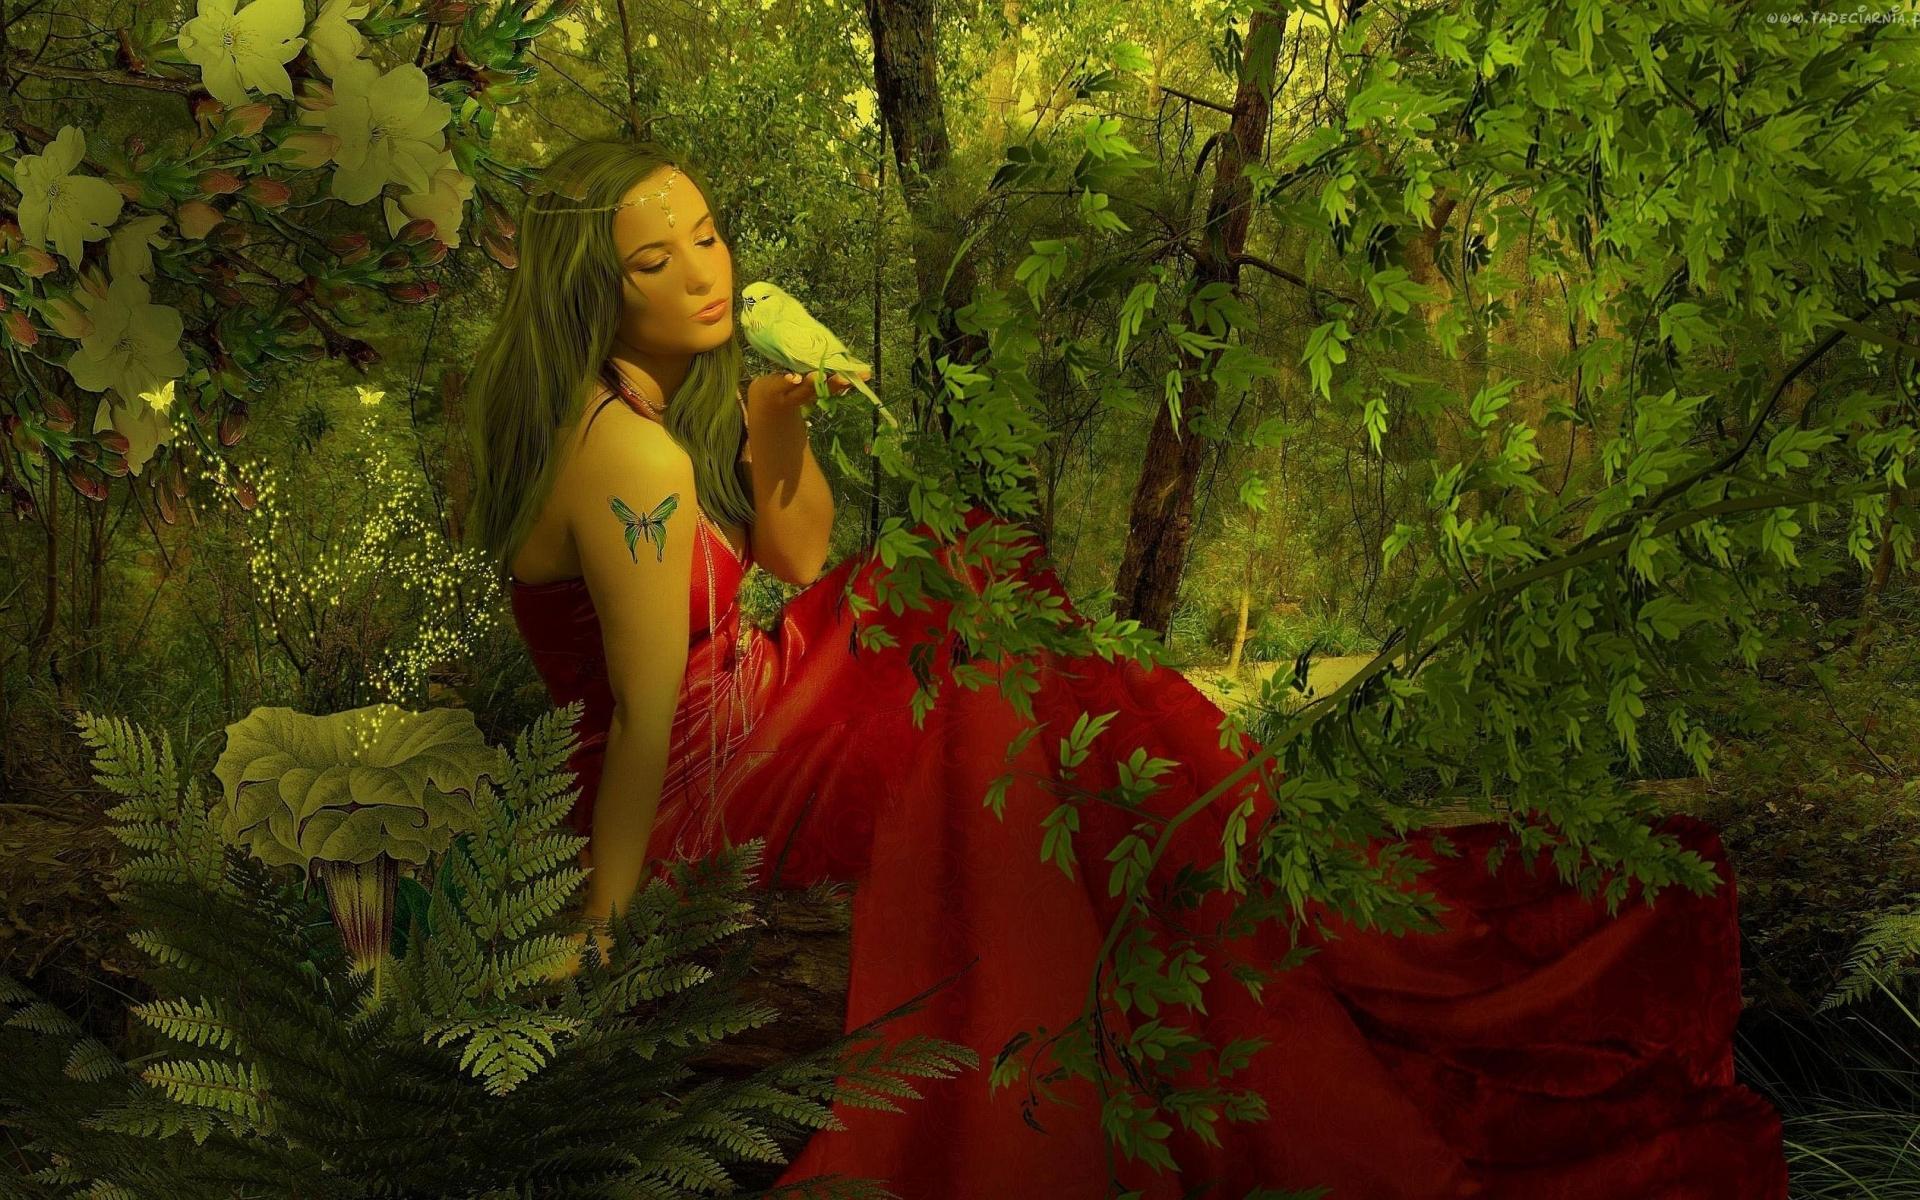 Fantasy art gothic trees forest nature birds mood fairy women ...